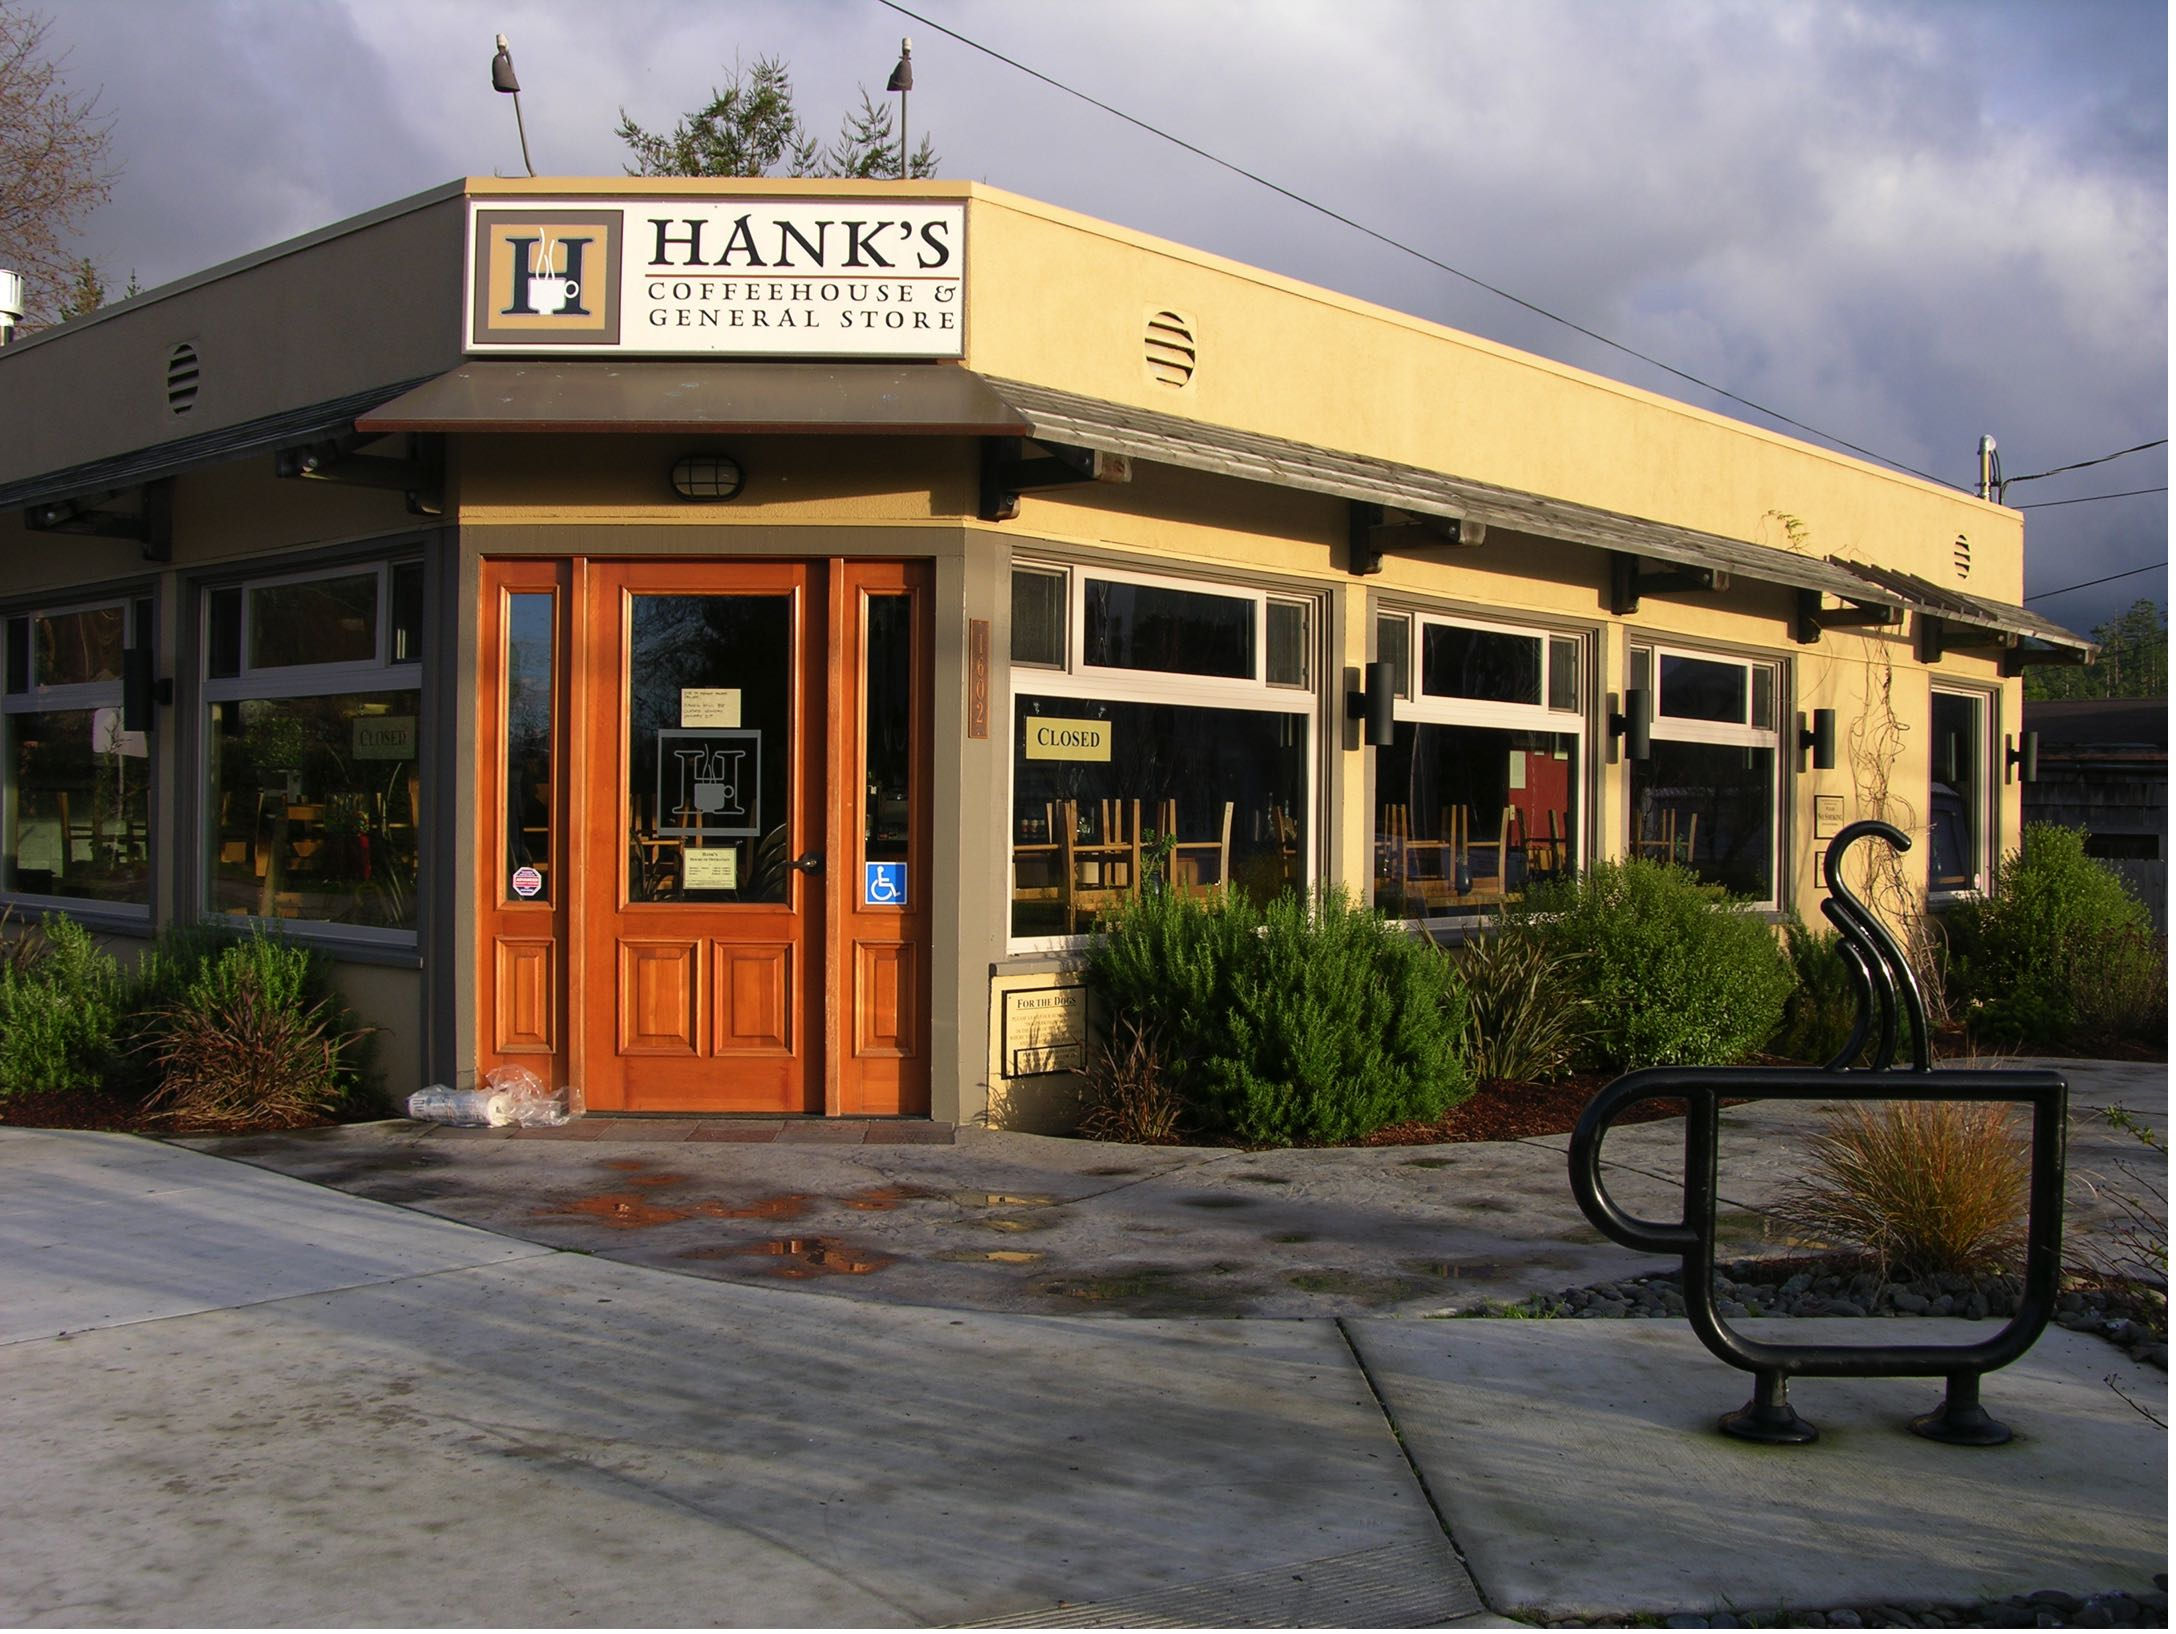 HANK'S COFFEEHOUSE